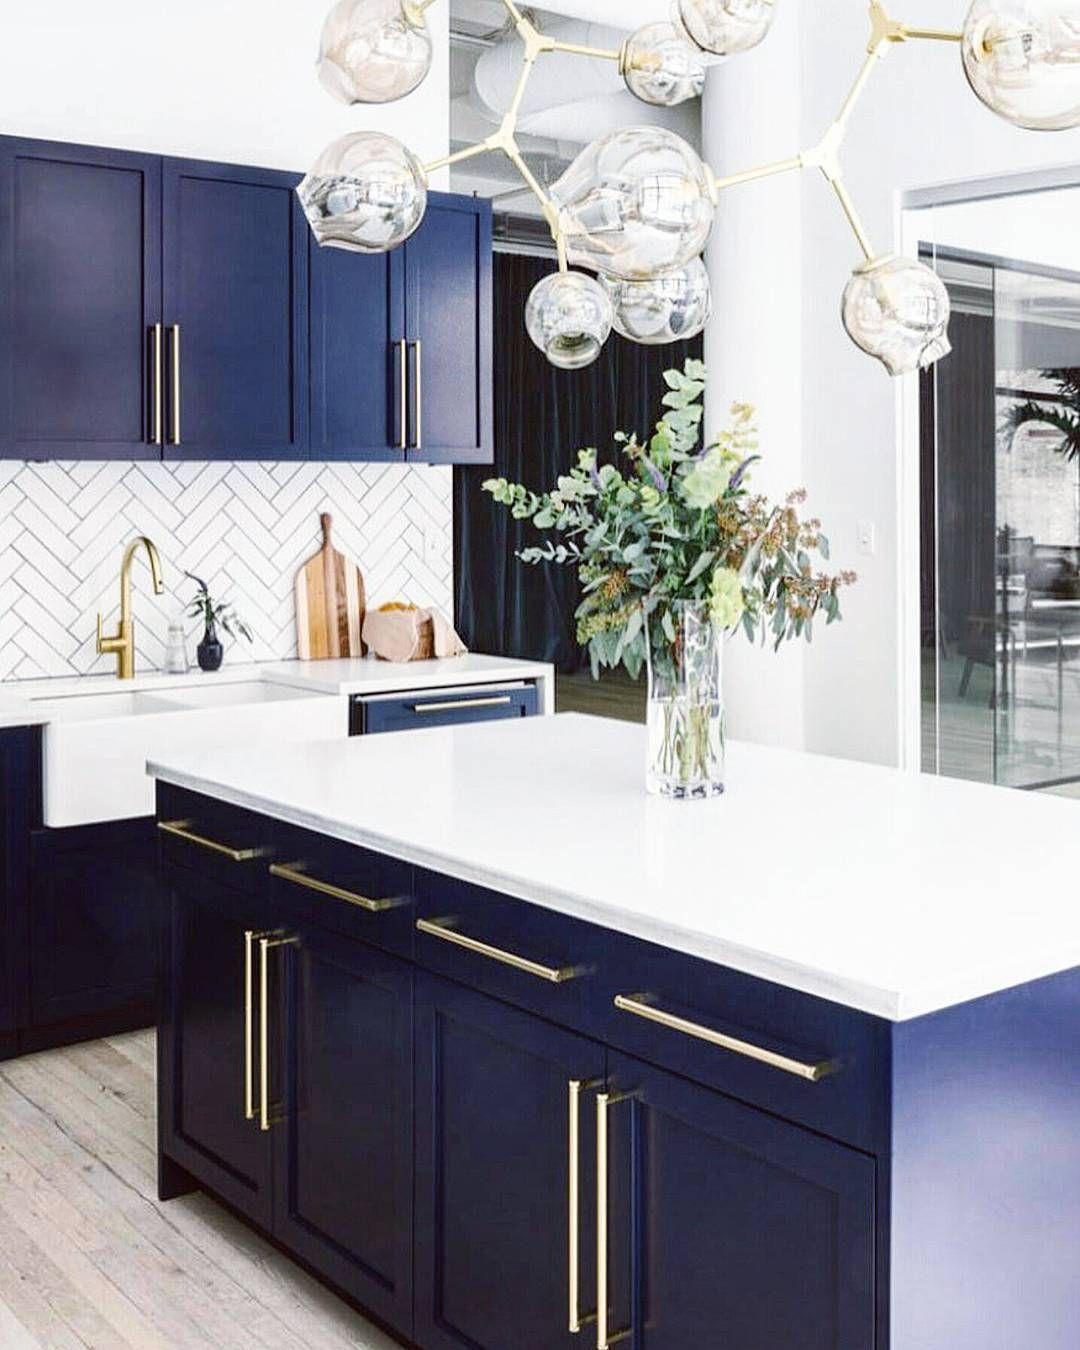 Navy cabinets, gold hardware, white backsplash | Kitchens | Pinterest